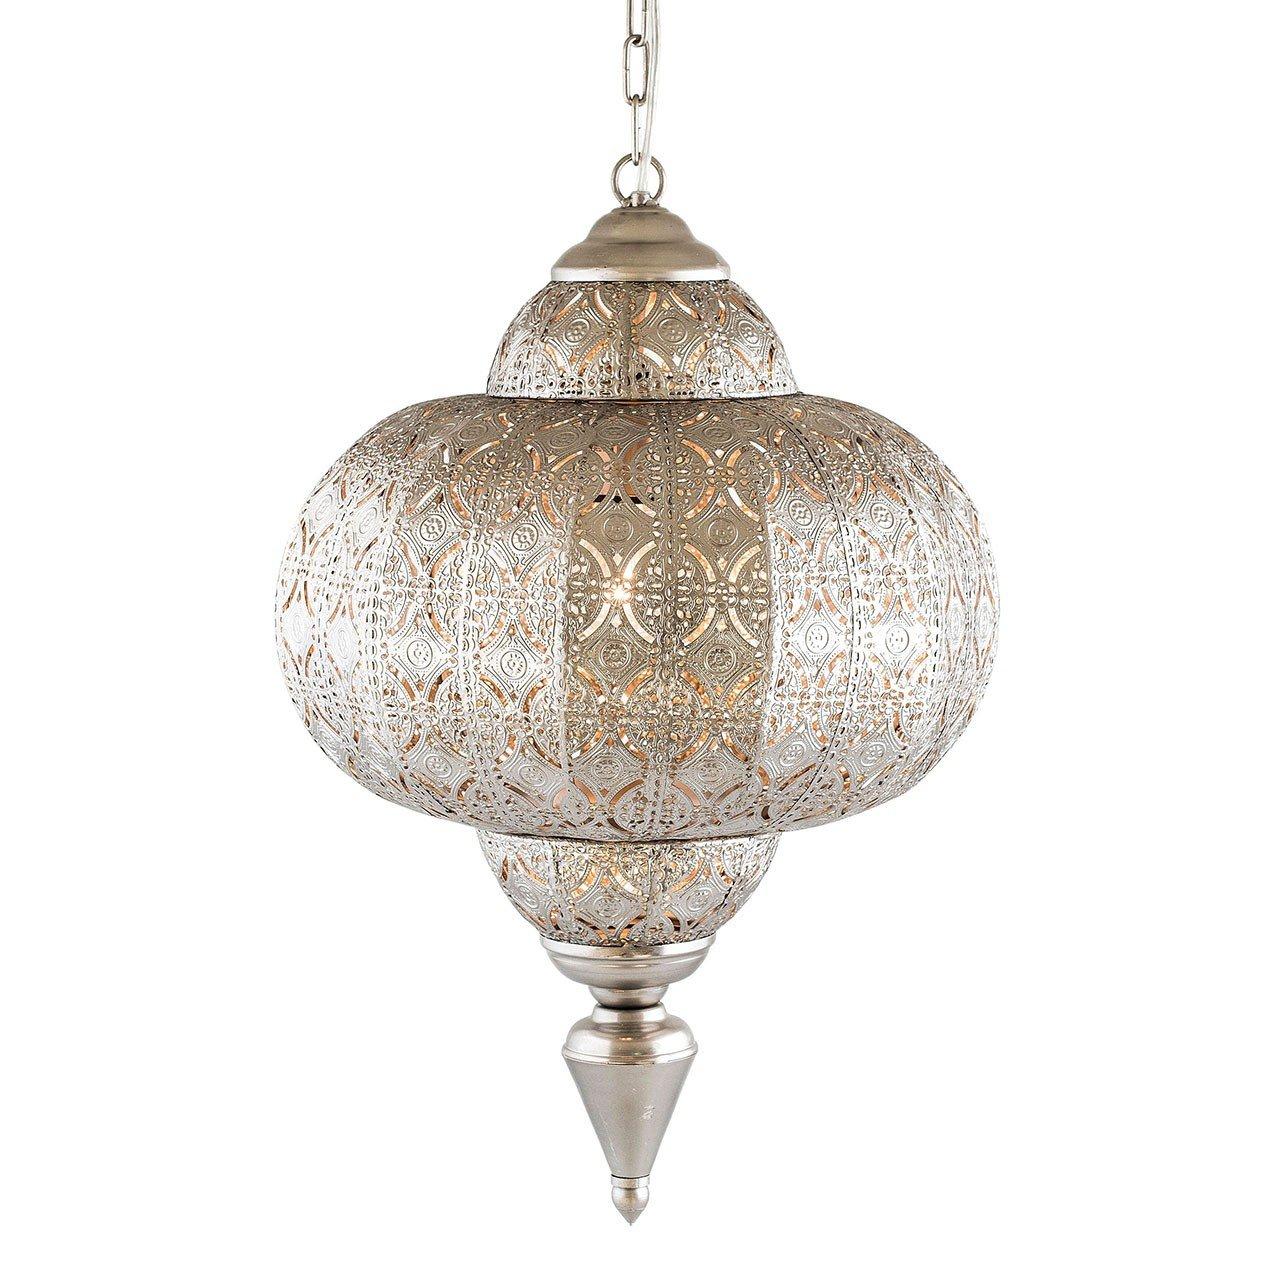 Pajoma Hängelampe Marokko, Metall, Metall, Marokko, Durchmesser 25 cm 13170 e44707